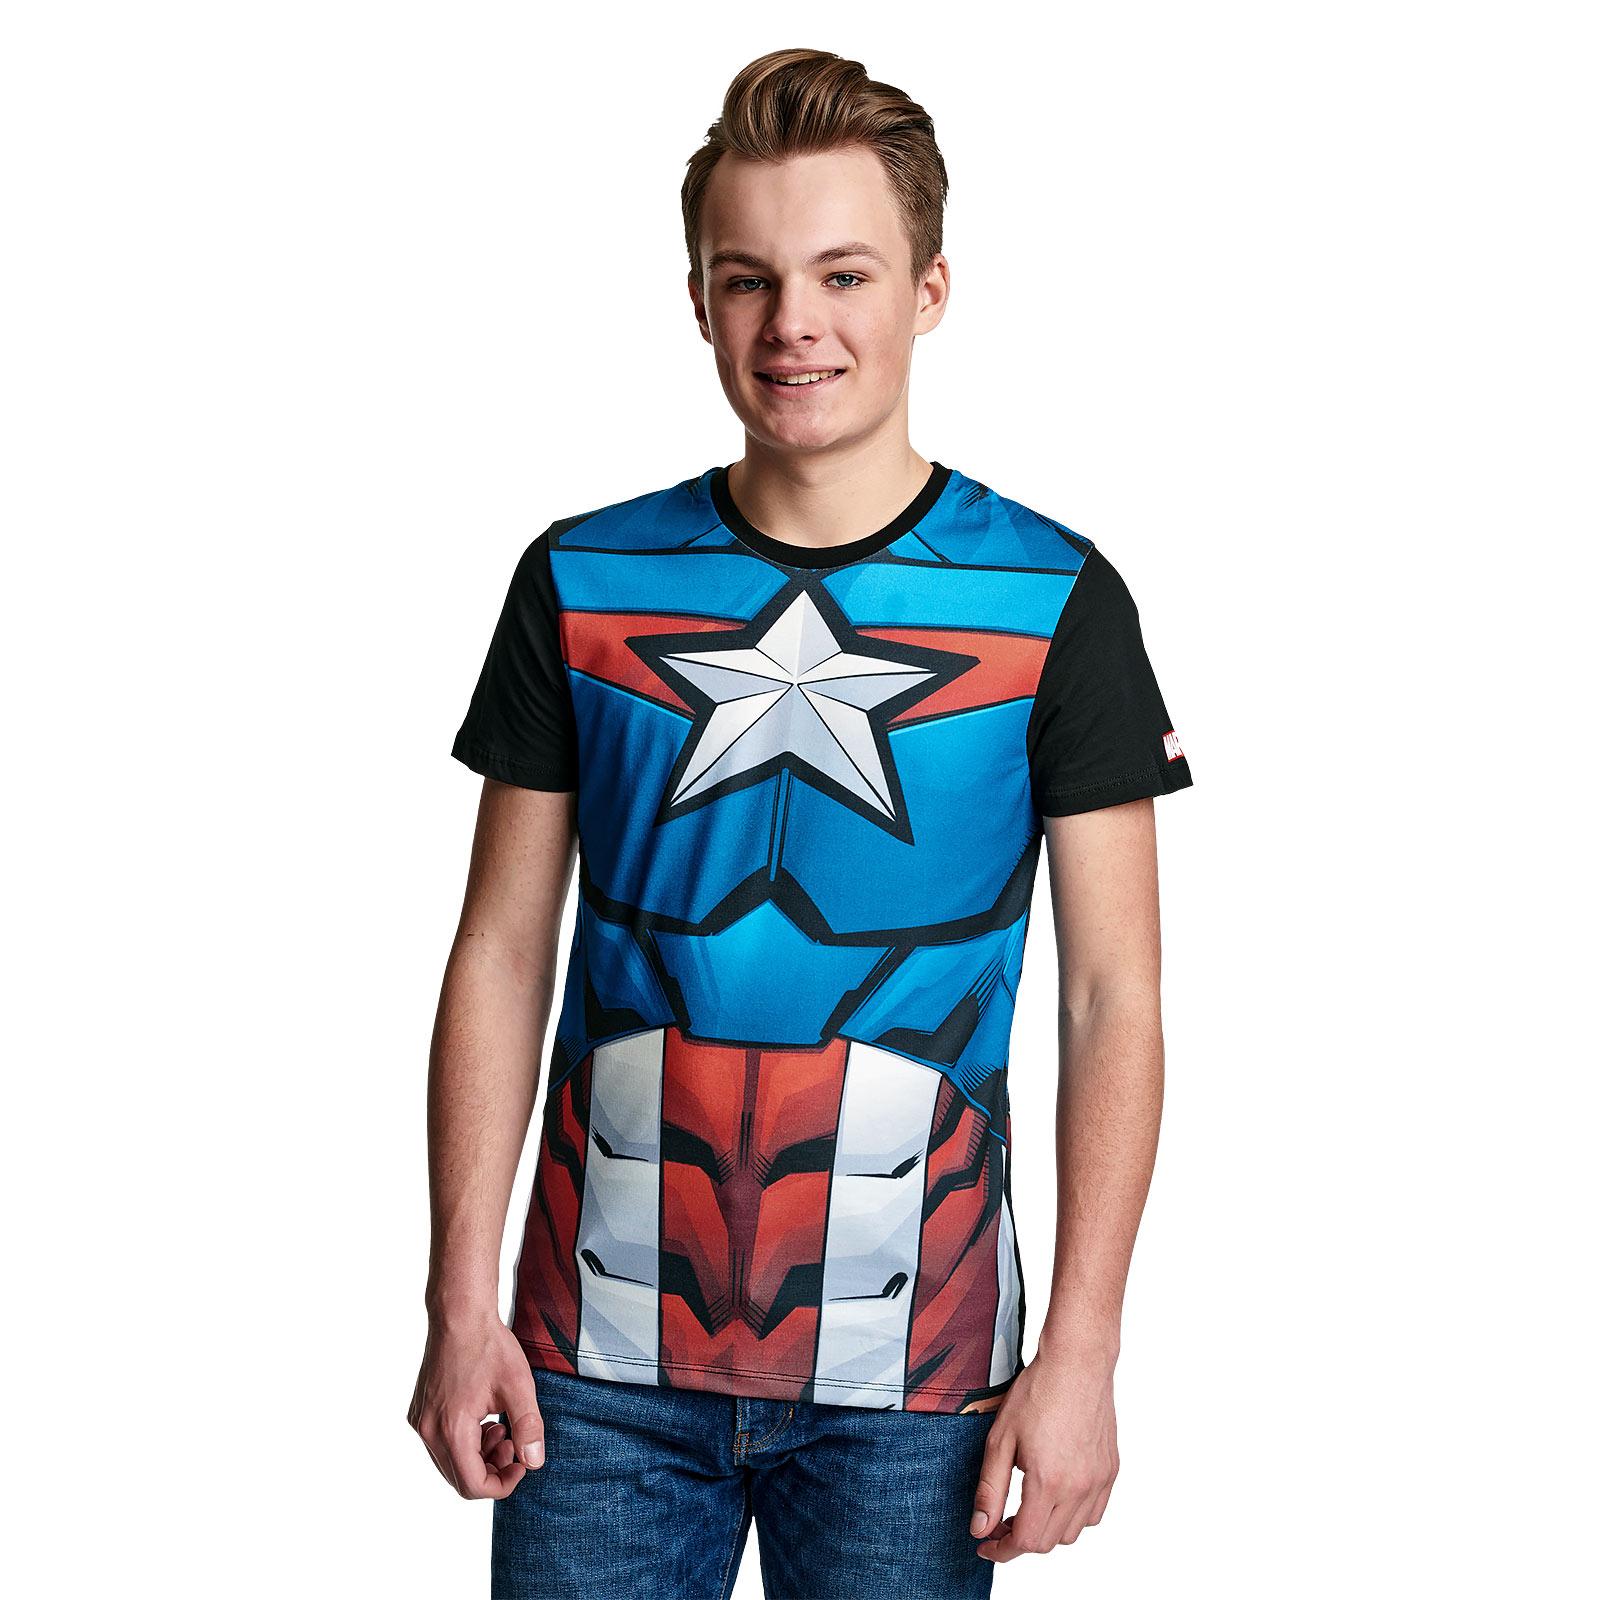 Captain America - Lookalike T-Shirt